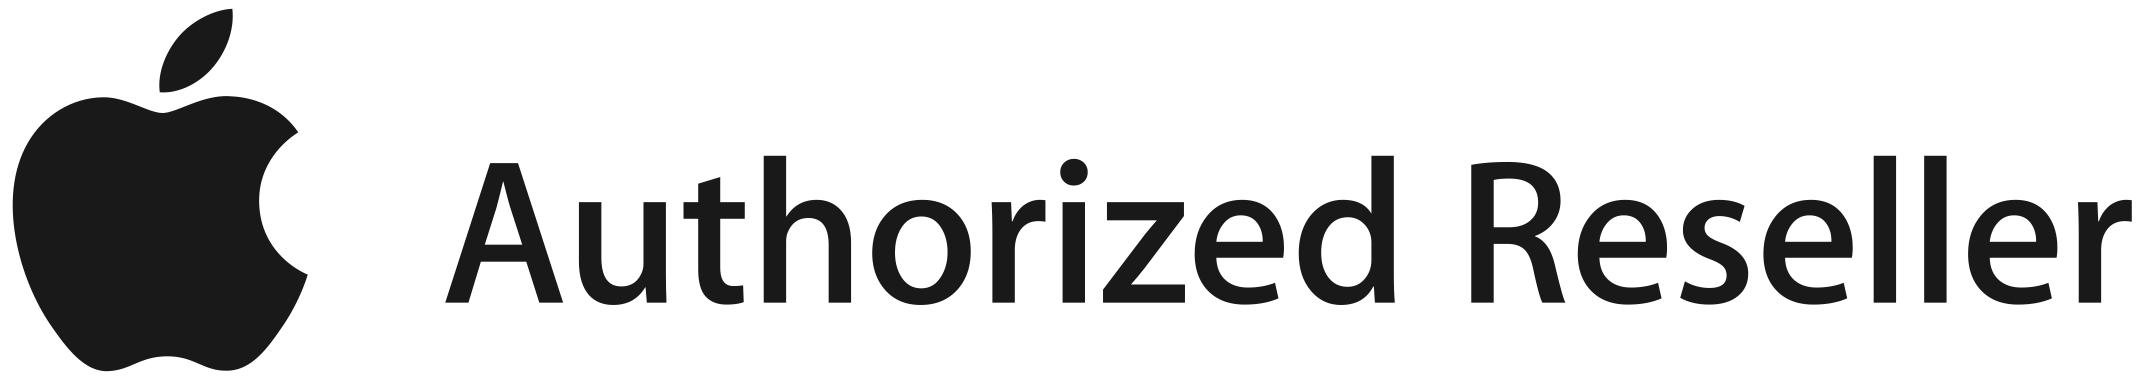 . Hdpng.com Authorized Dealer Png Hdpng Pluspng.com 1600 Компания Divizion Имеет Статус Официального Продавца Техники Apple. У Нас Вы Сможете Найти Самый Полный . - Apple Authorized Reseller, Transparent background PNG HD thumbnail